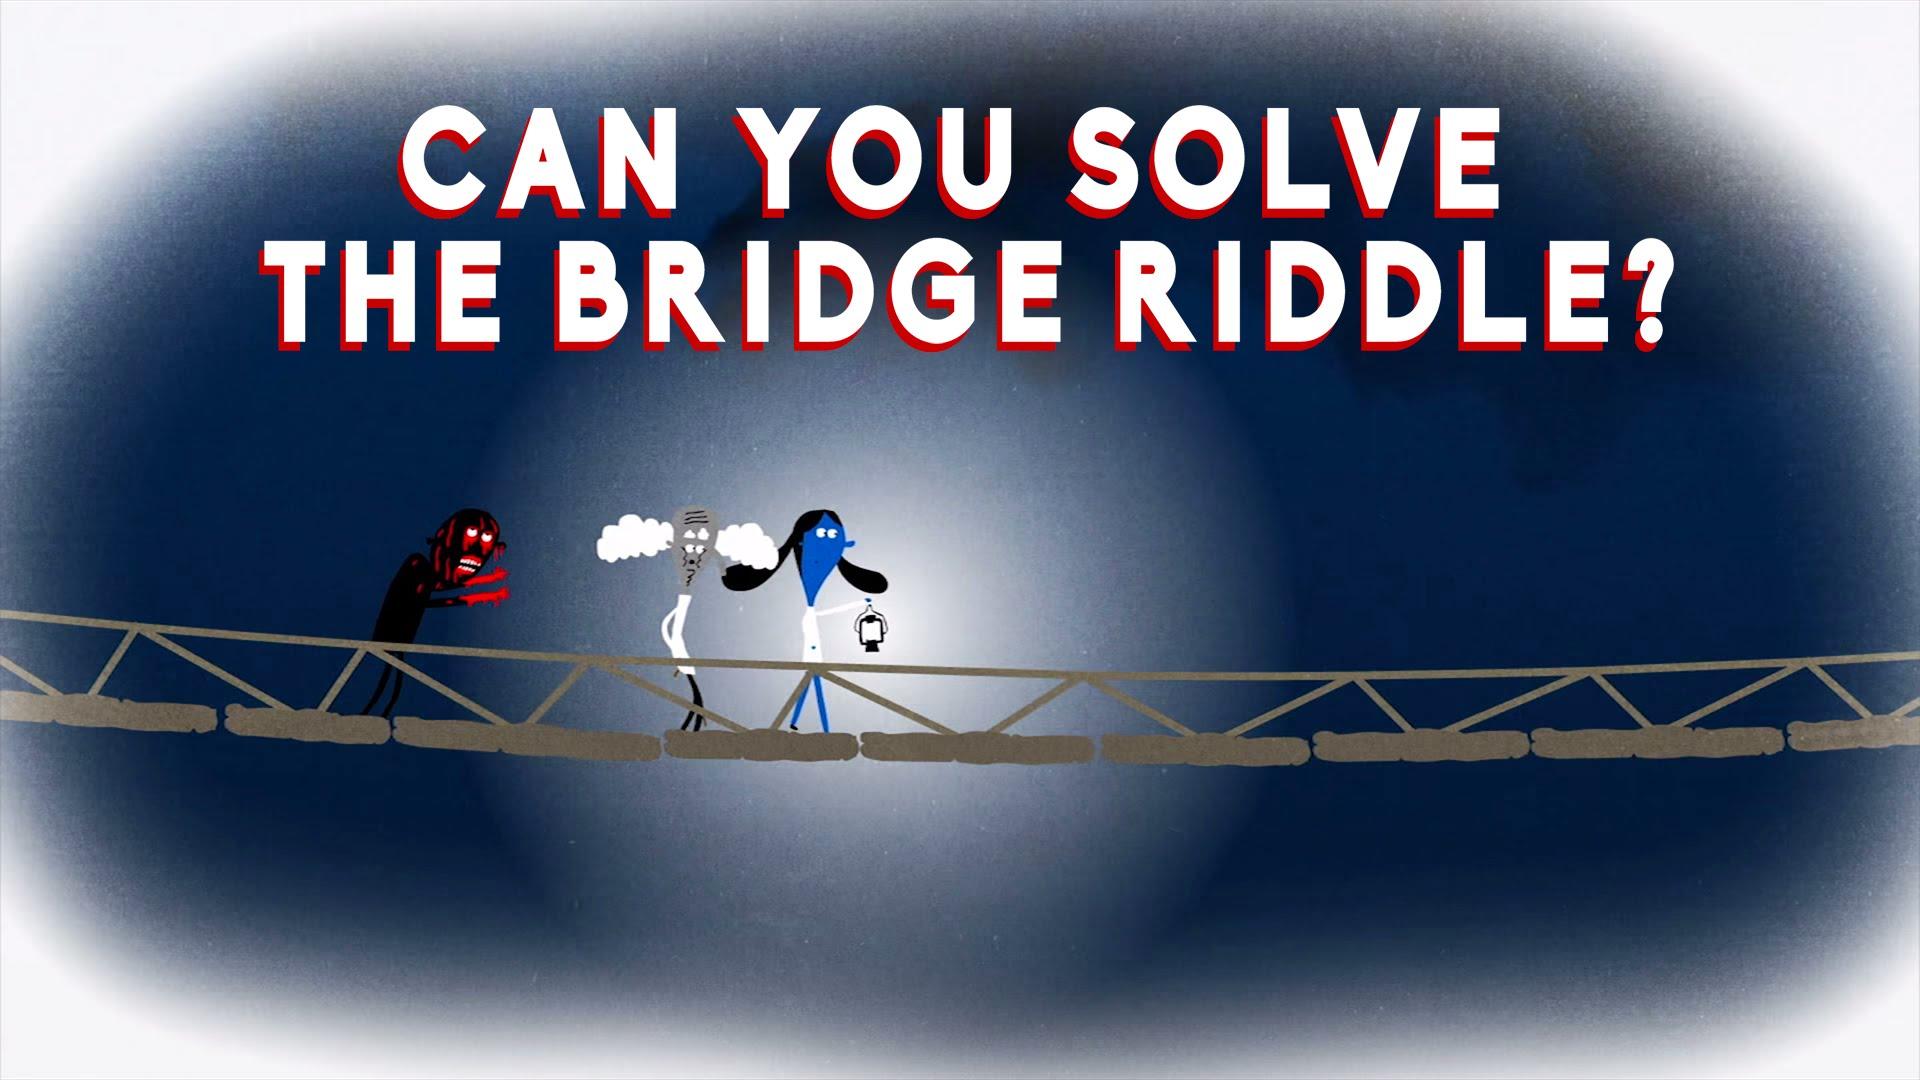 Can You Solve The Bridge Riddle Saturdaymorningcartoons